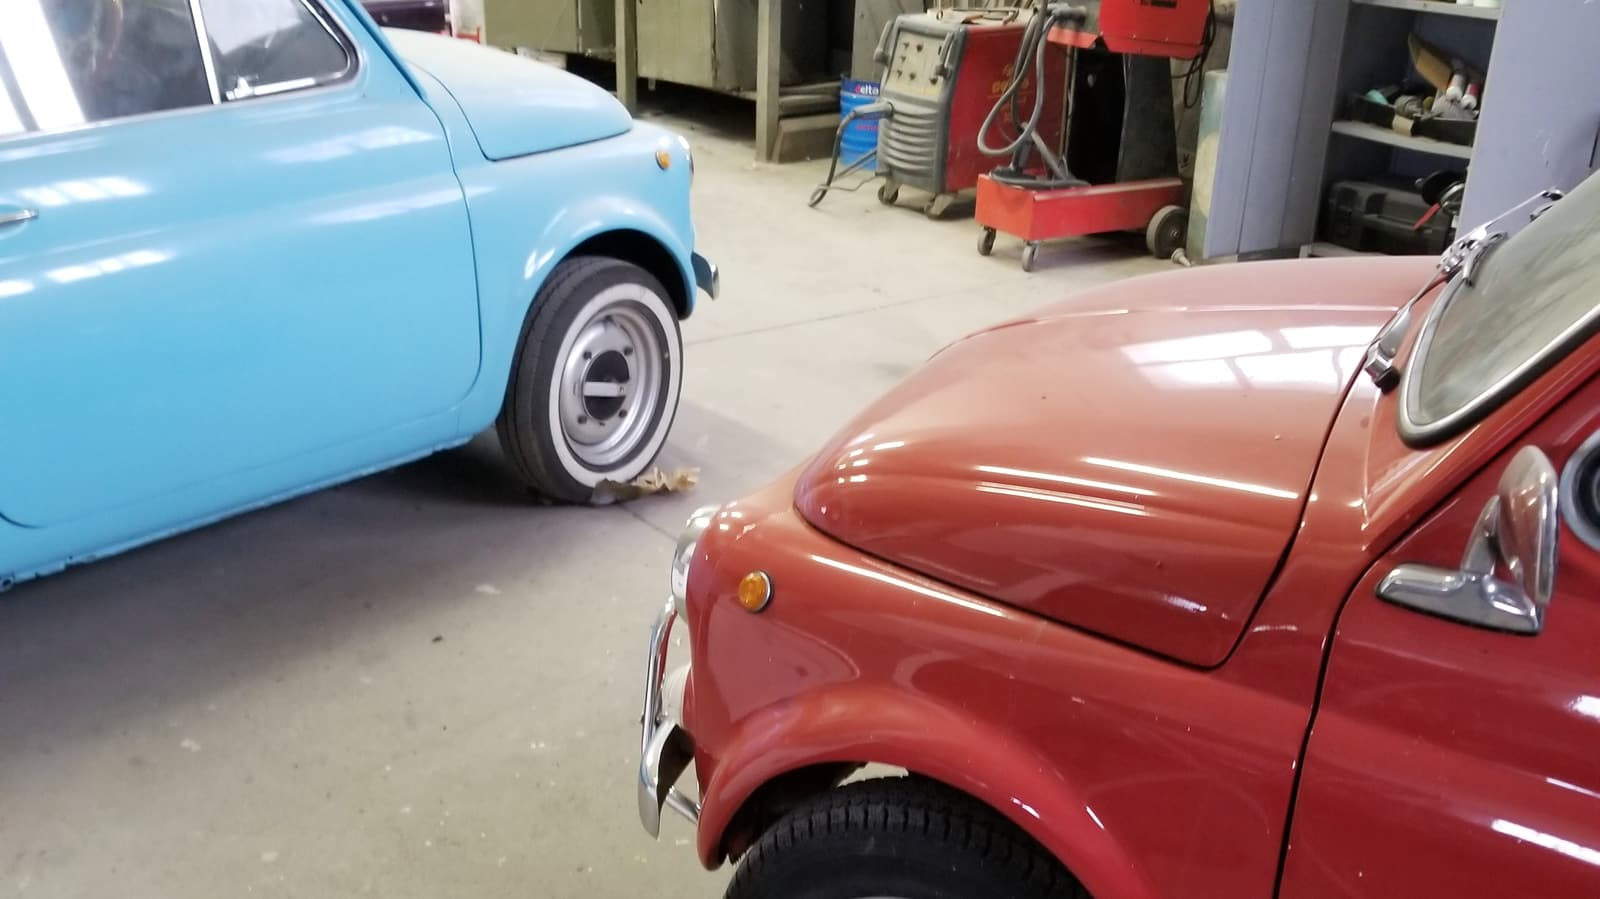 due Fiat 500, una celeste ed una rossa, in carrozzeria